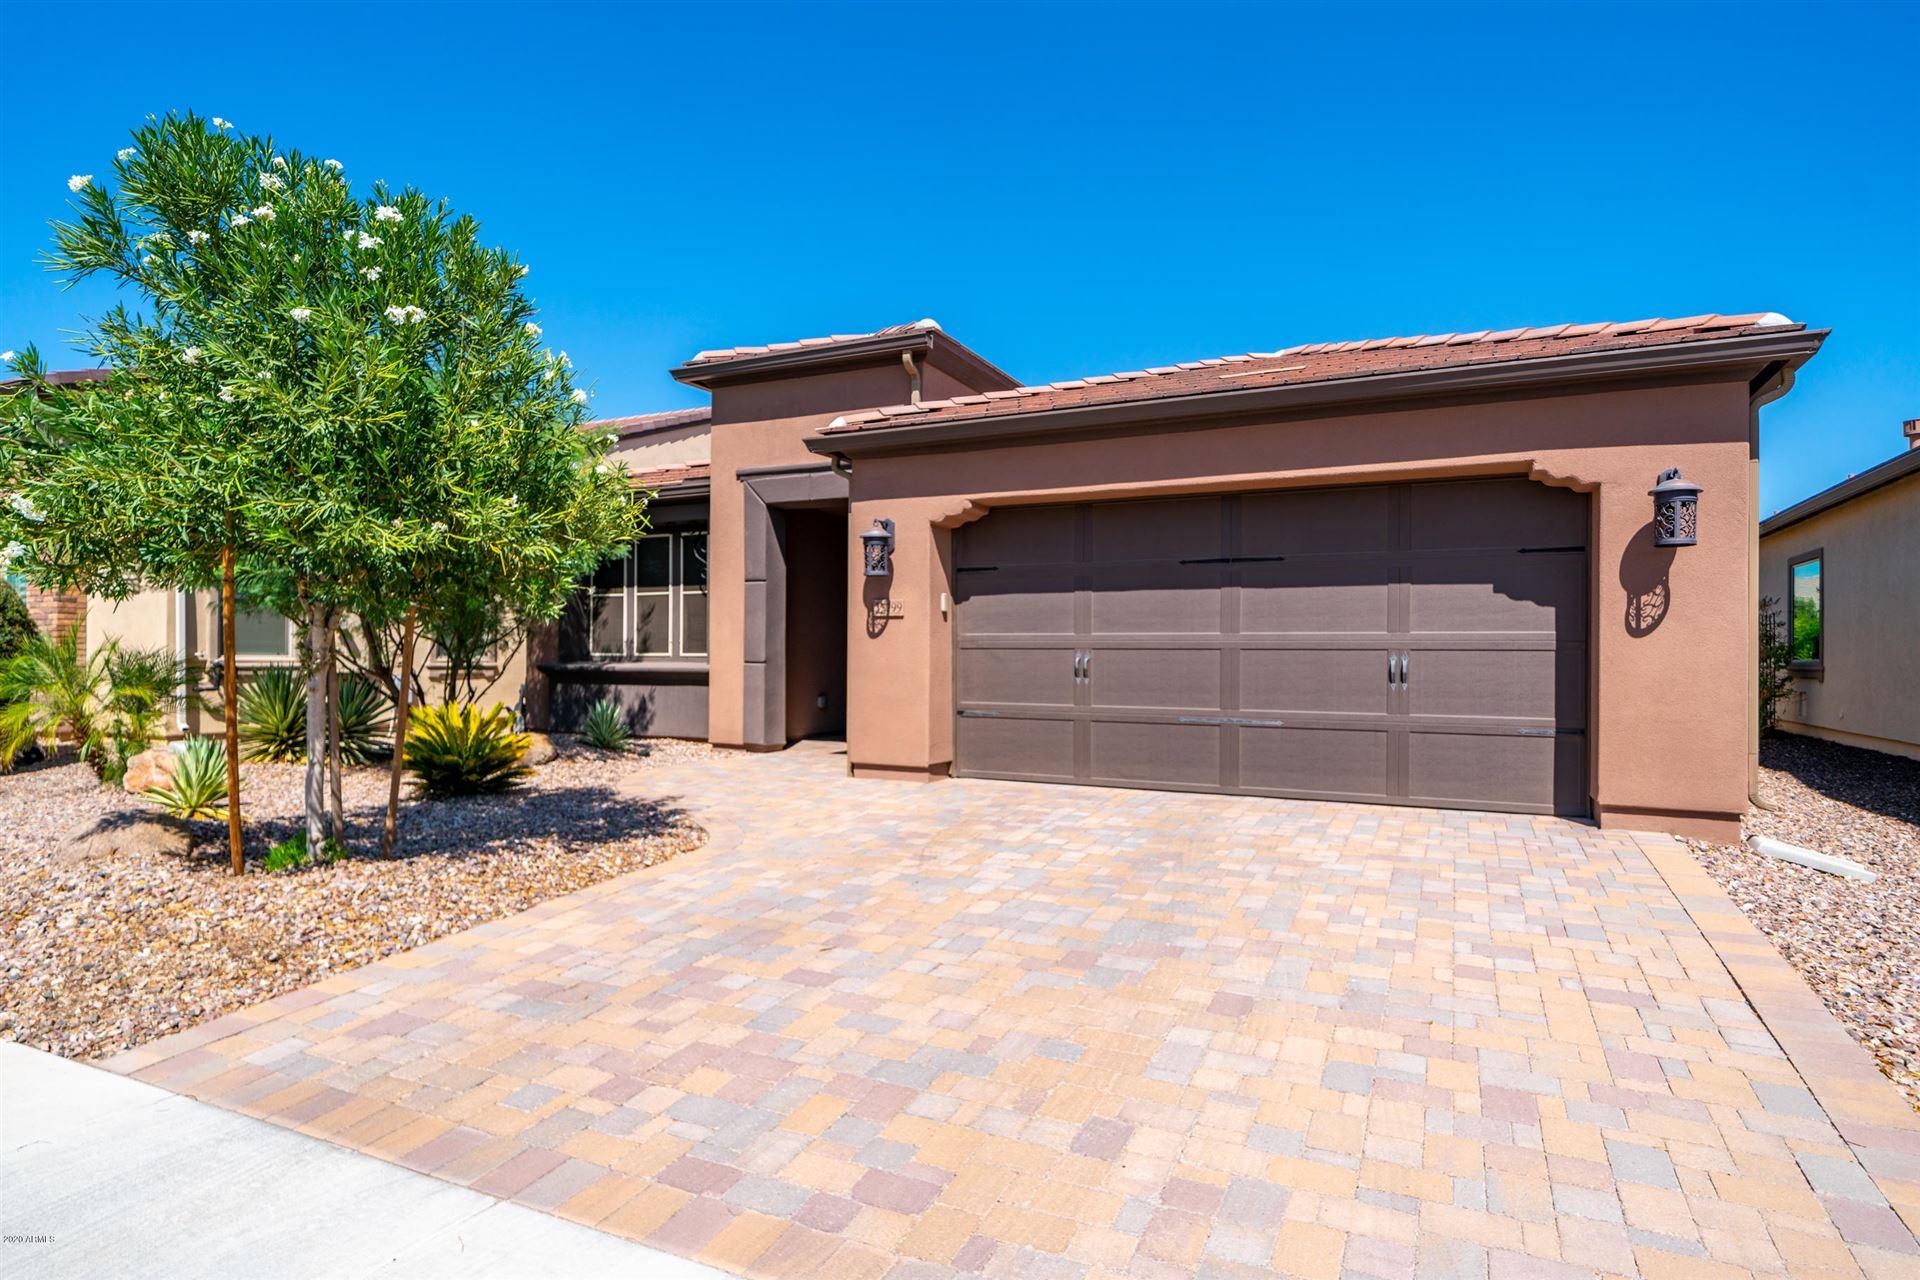 35799 N ANTHOS Way, Queen Creek, AZ 85140 - MLS#: 6117346